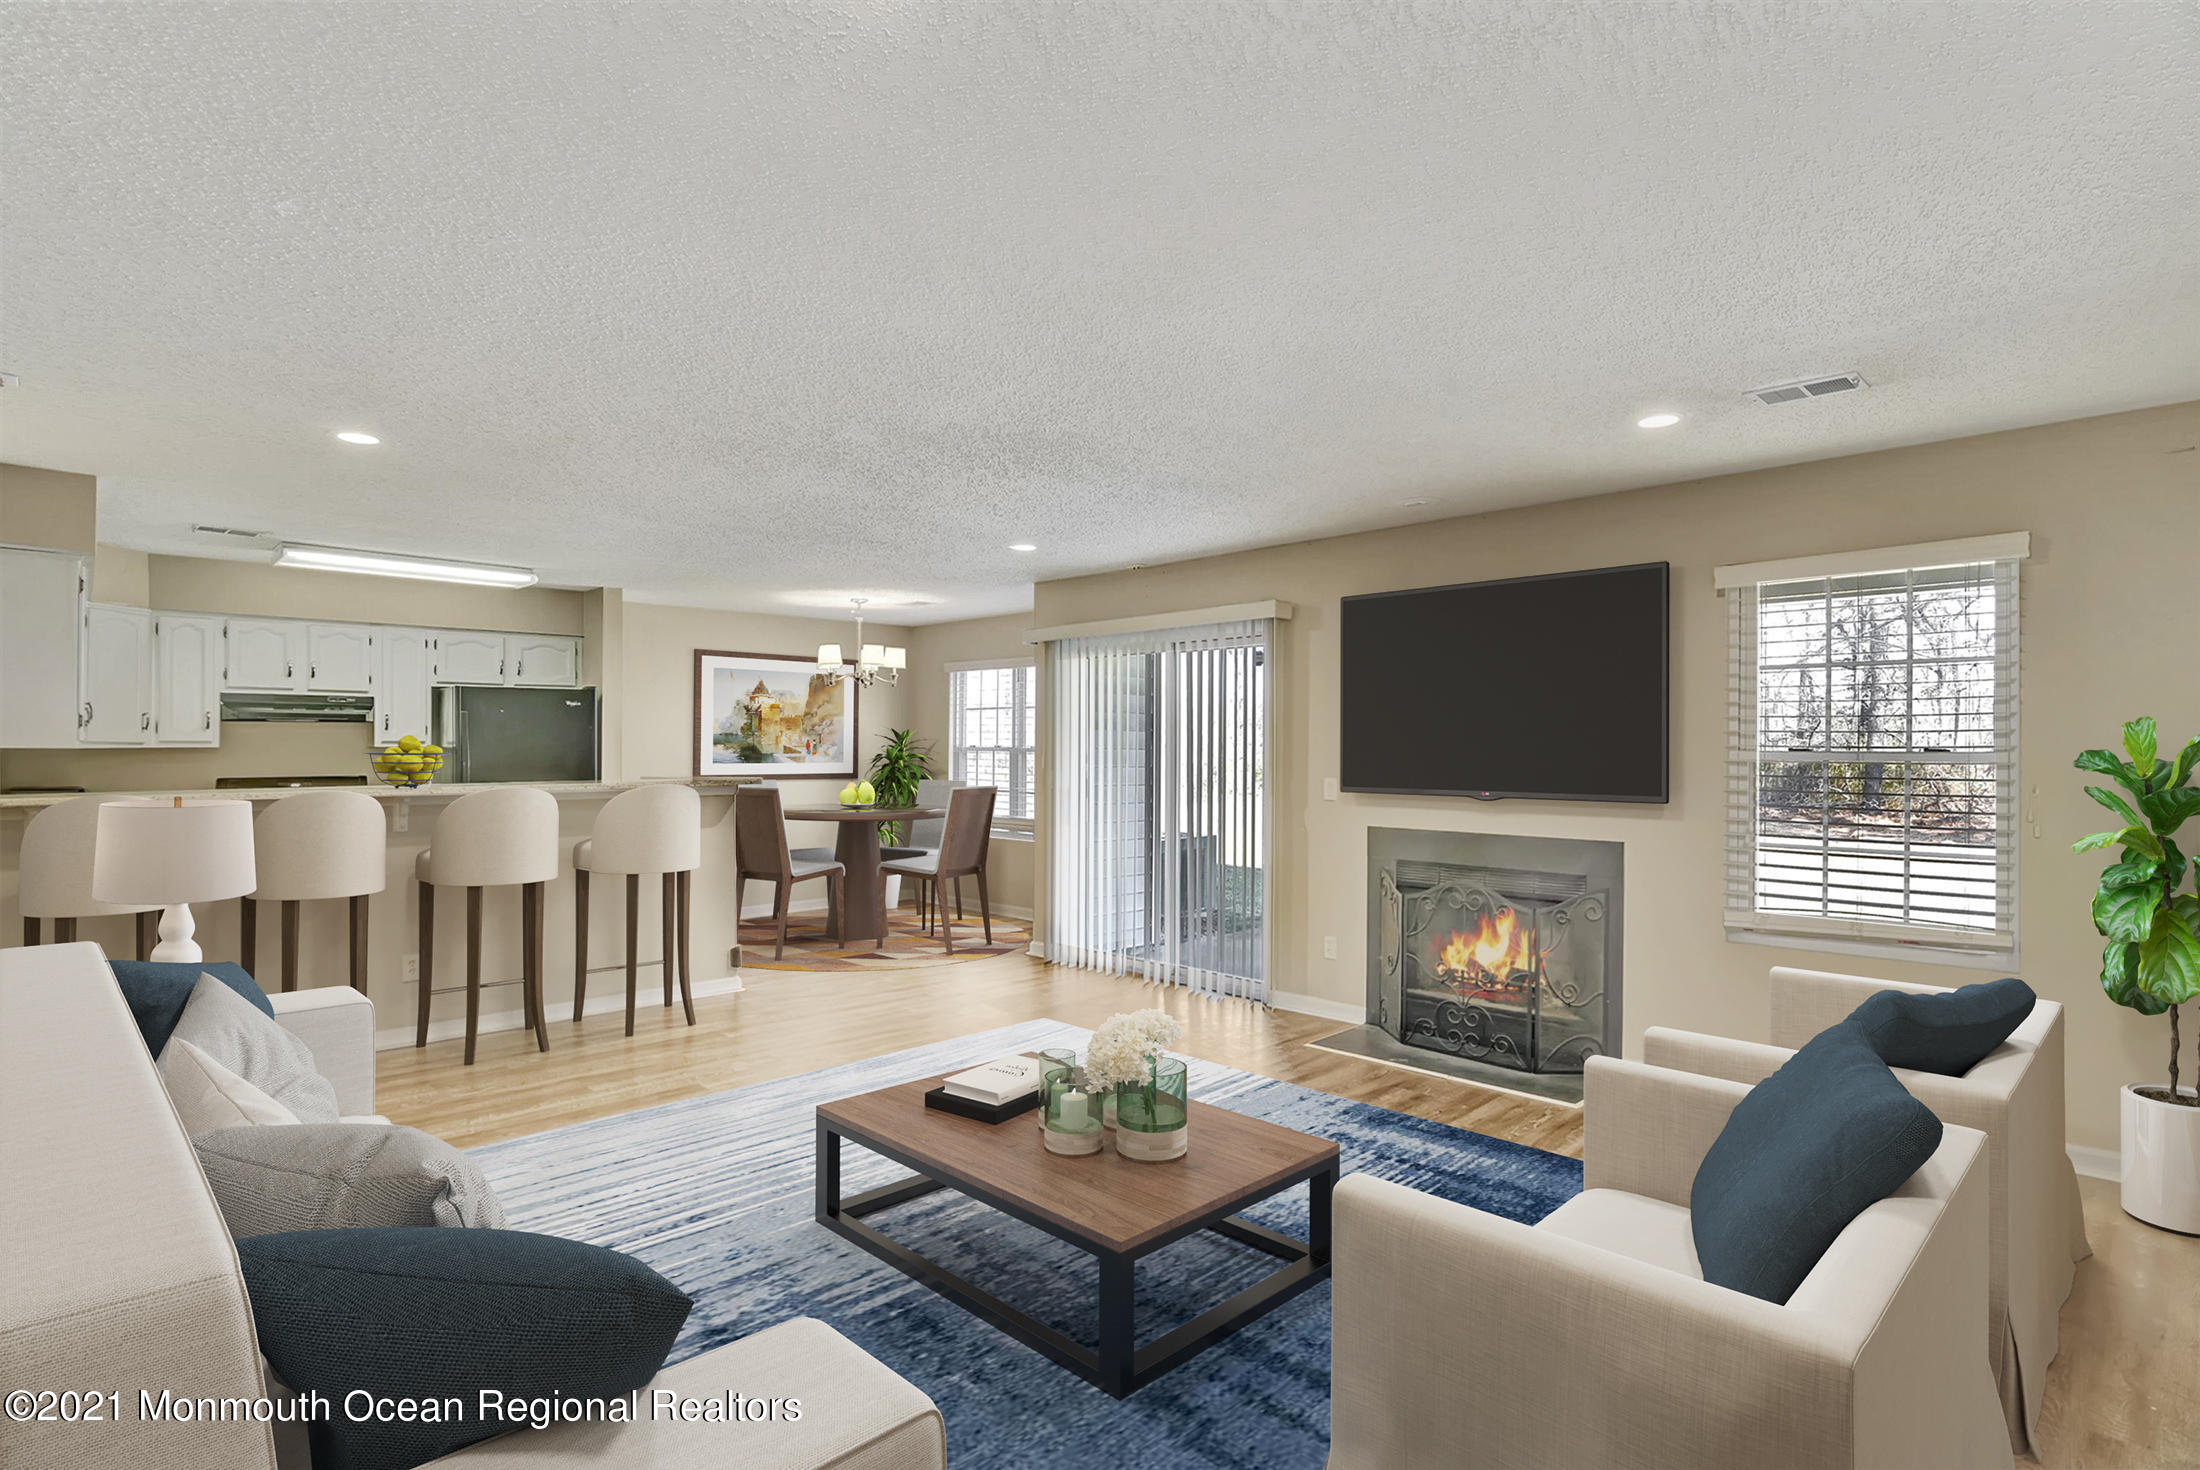 613 Waters Edge Drive, Toms River, New Jersey 08753, 2 Bedrooms Bedrooms, ,2 BathroomsBathrooms,Condominium,For Sale,613 Waters Edge Drive,1,22107264